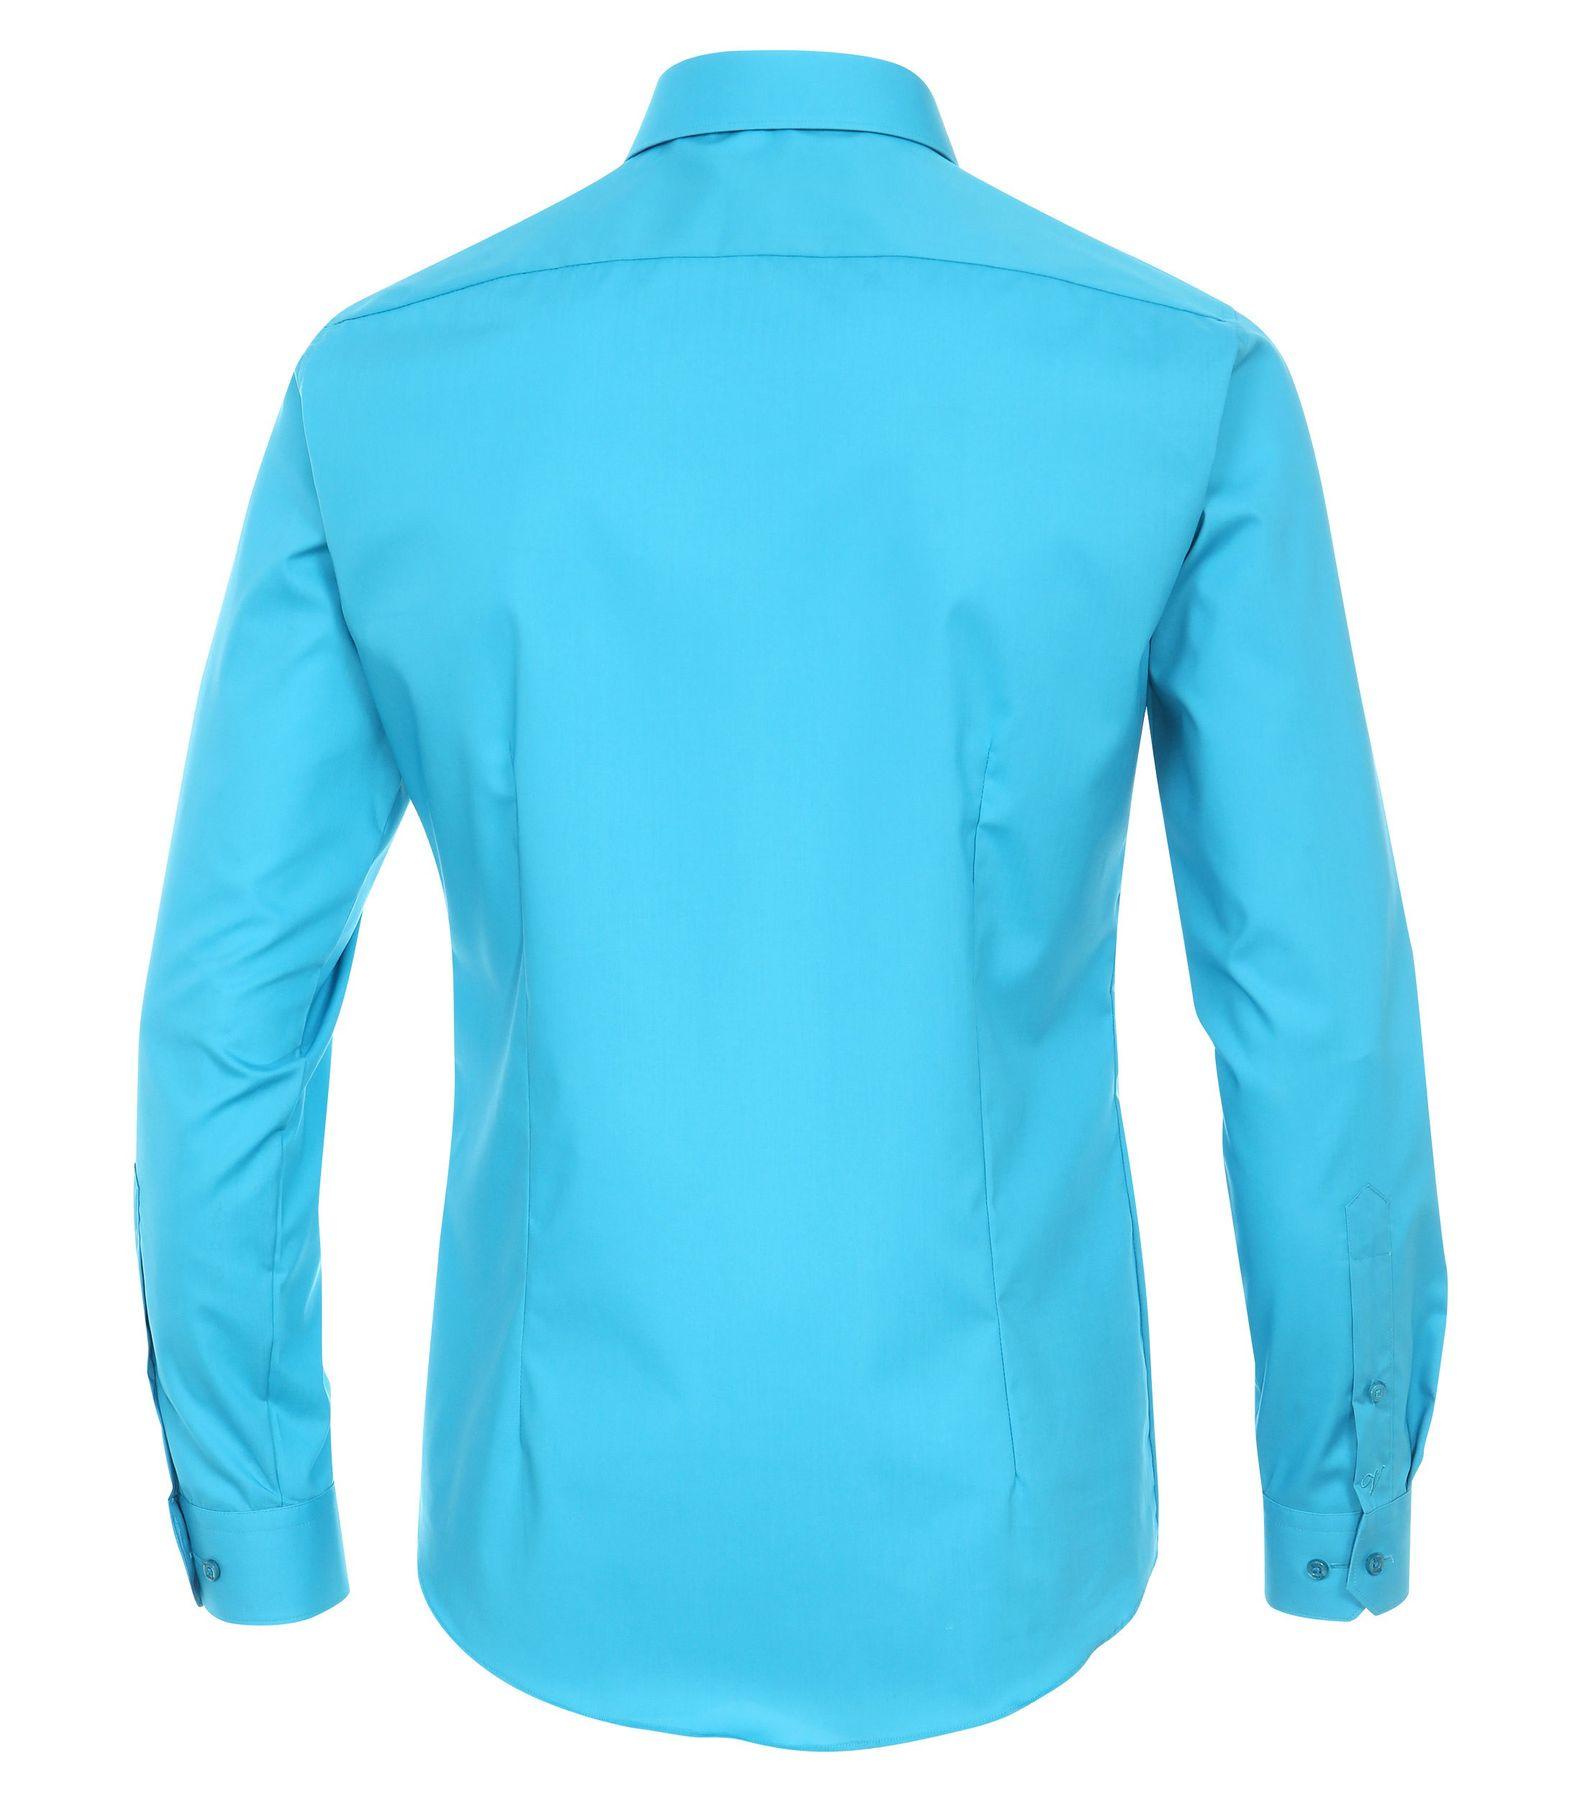 Venti - Body Fit/Super Slim Fit - Bügelfreies Herren Langarm Hemd in diversen Farben (001470) – Bild 20